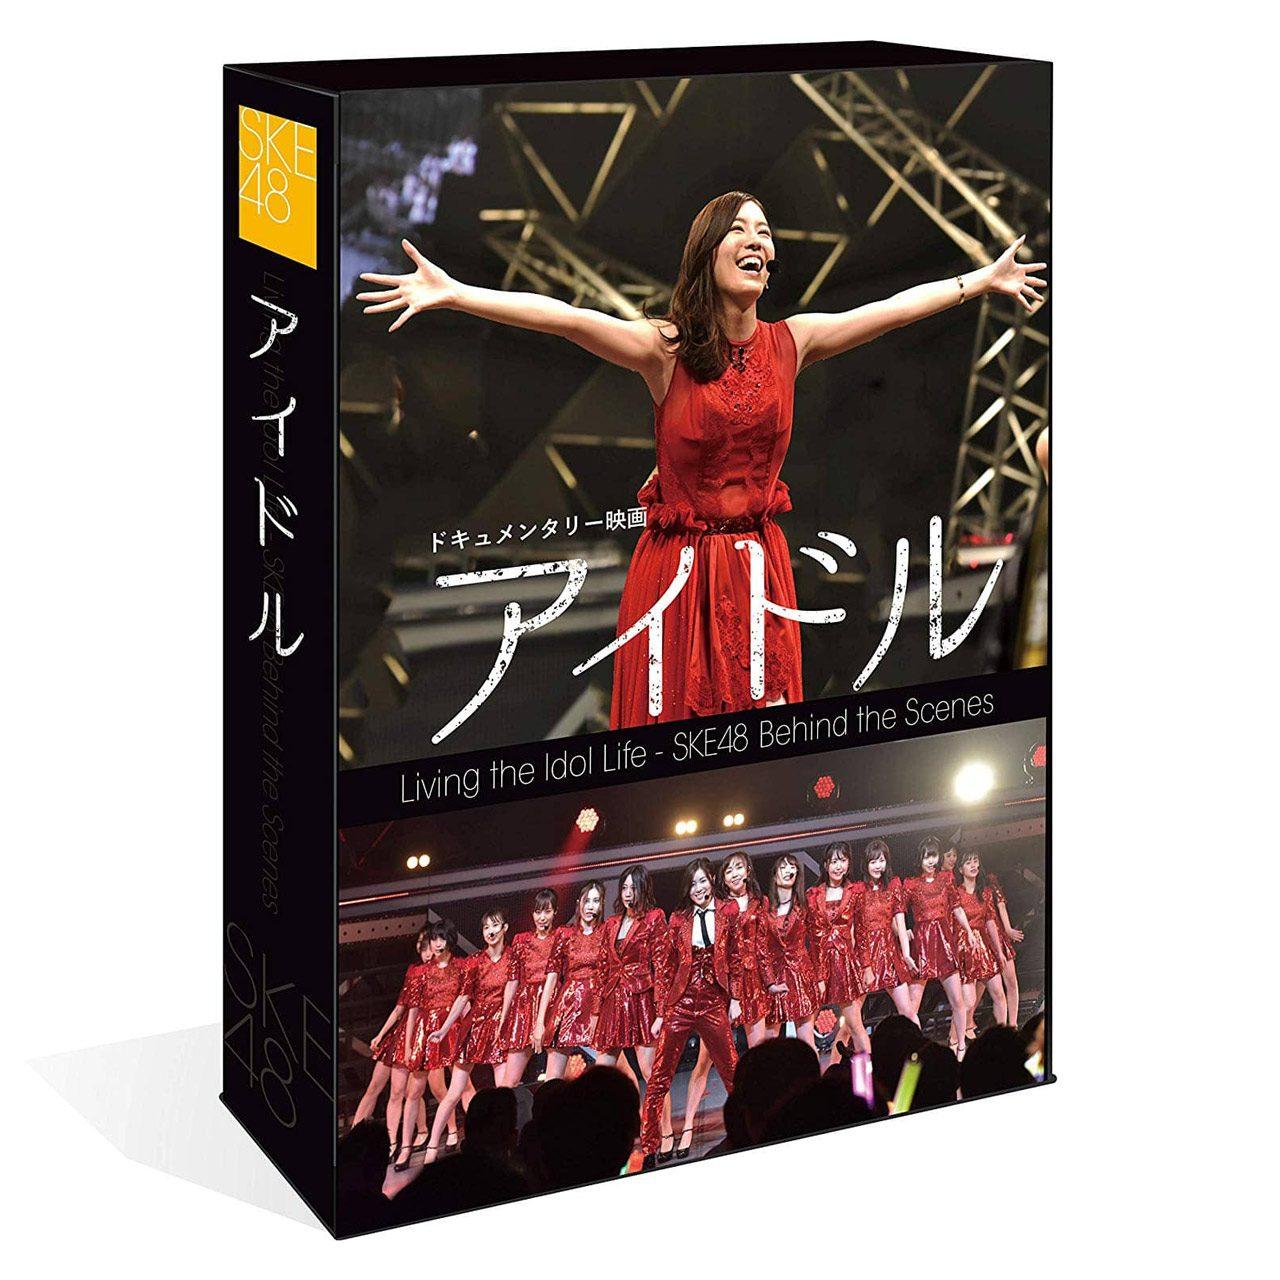 SKE48 ドキュメンタリー映画「アイドル」 [DVD][Blu-ray]